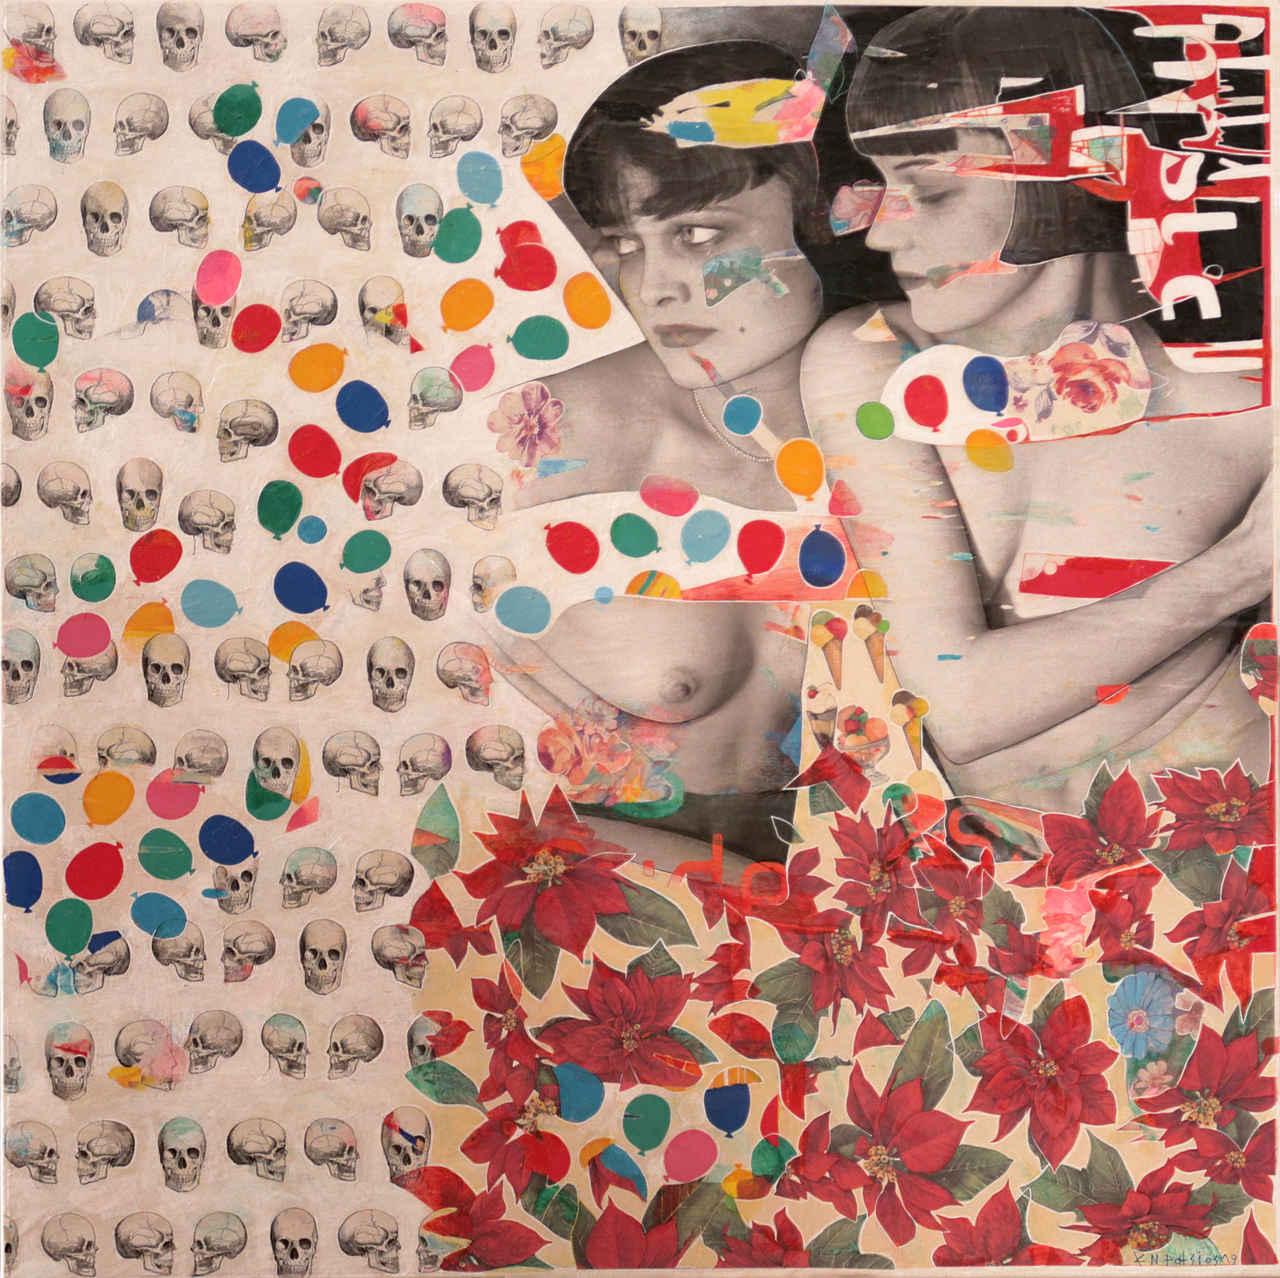 Konstantinos Patsios, She lives on love street, 100 x 100 cm, mixed media on canvas, 2019